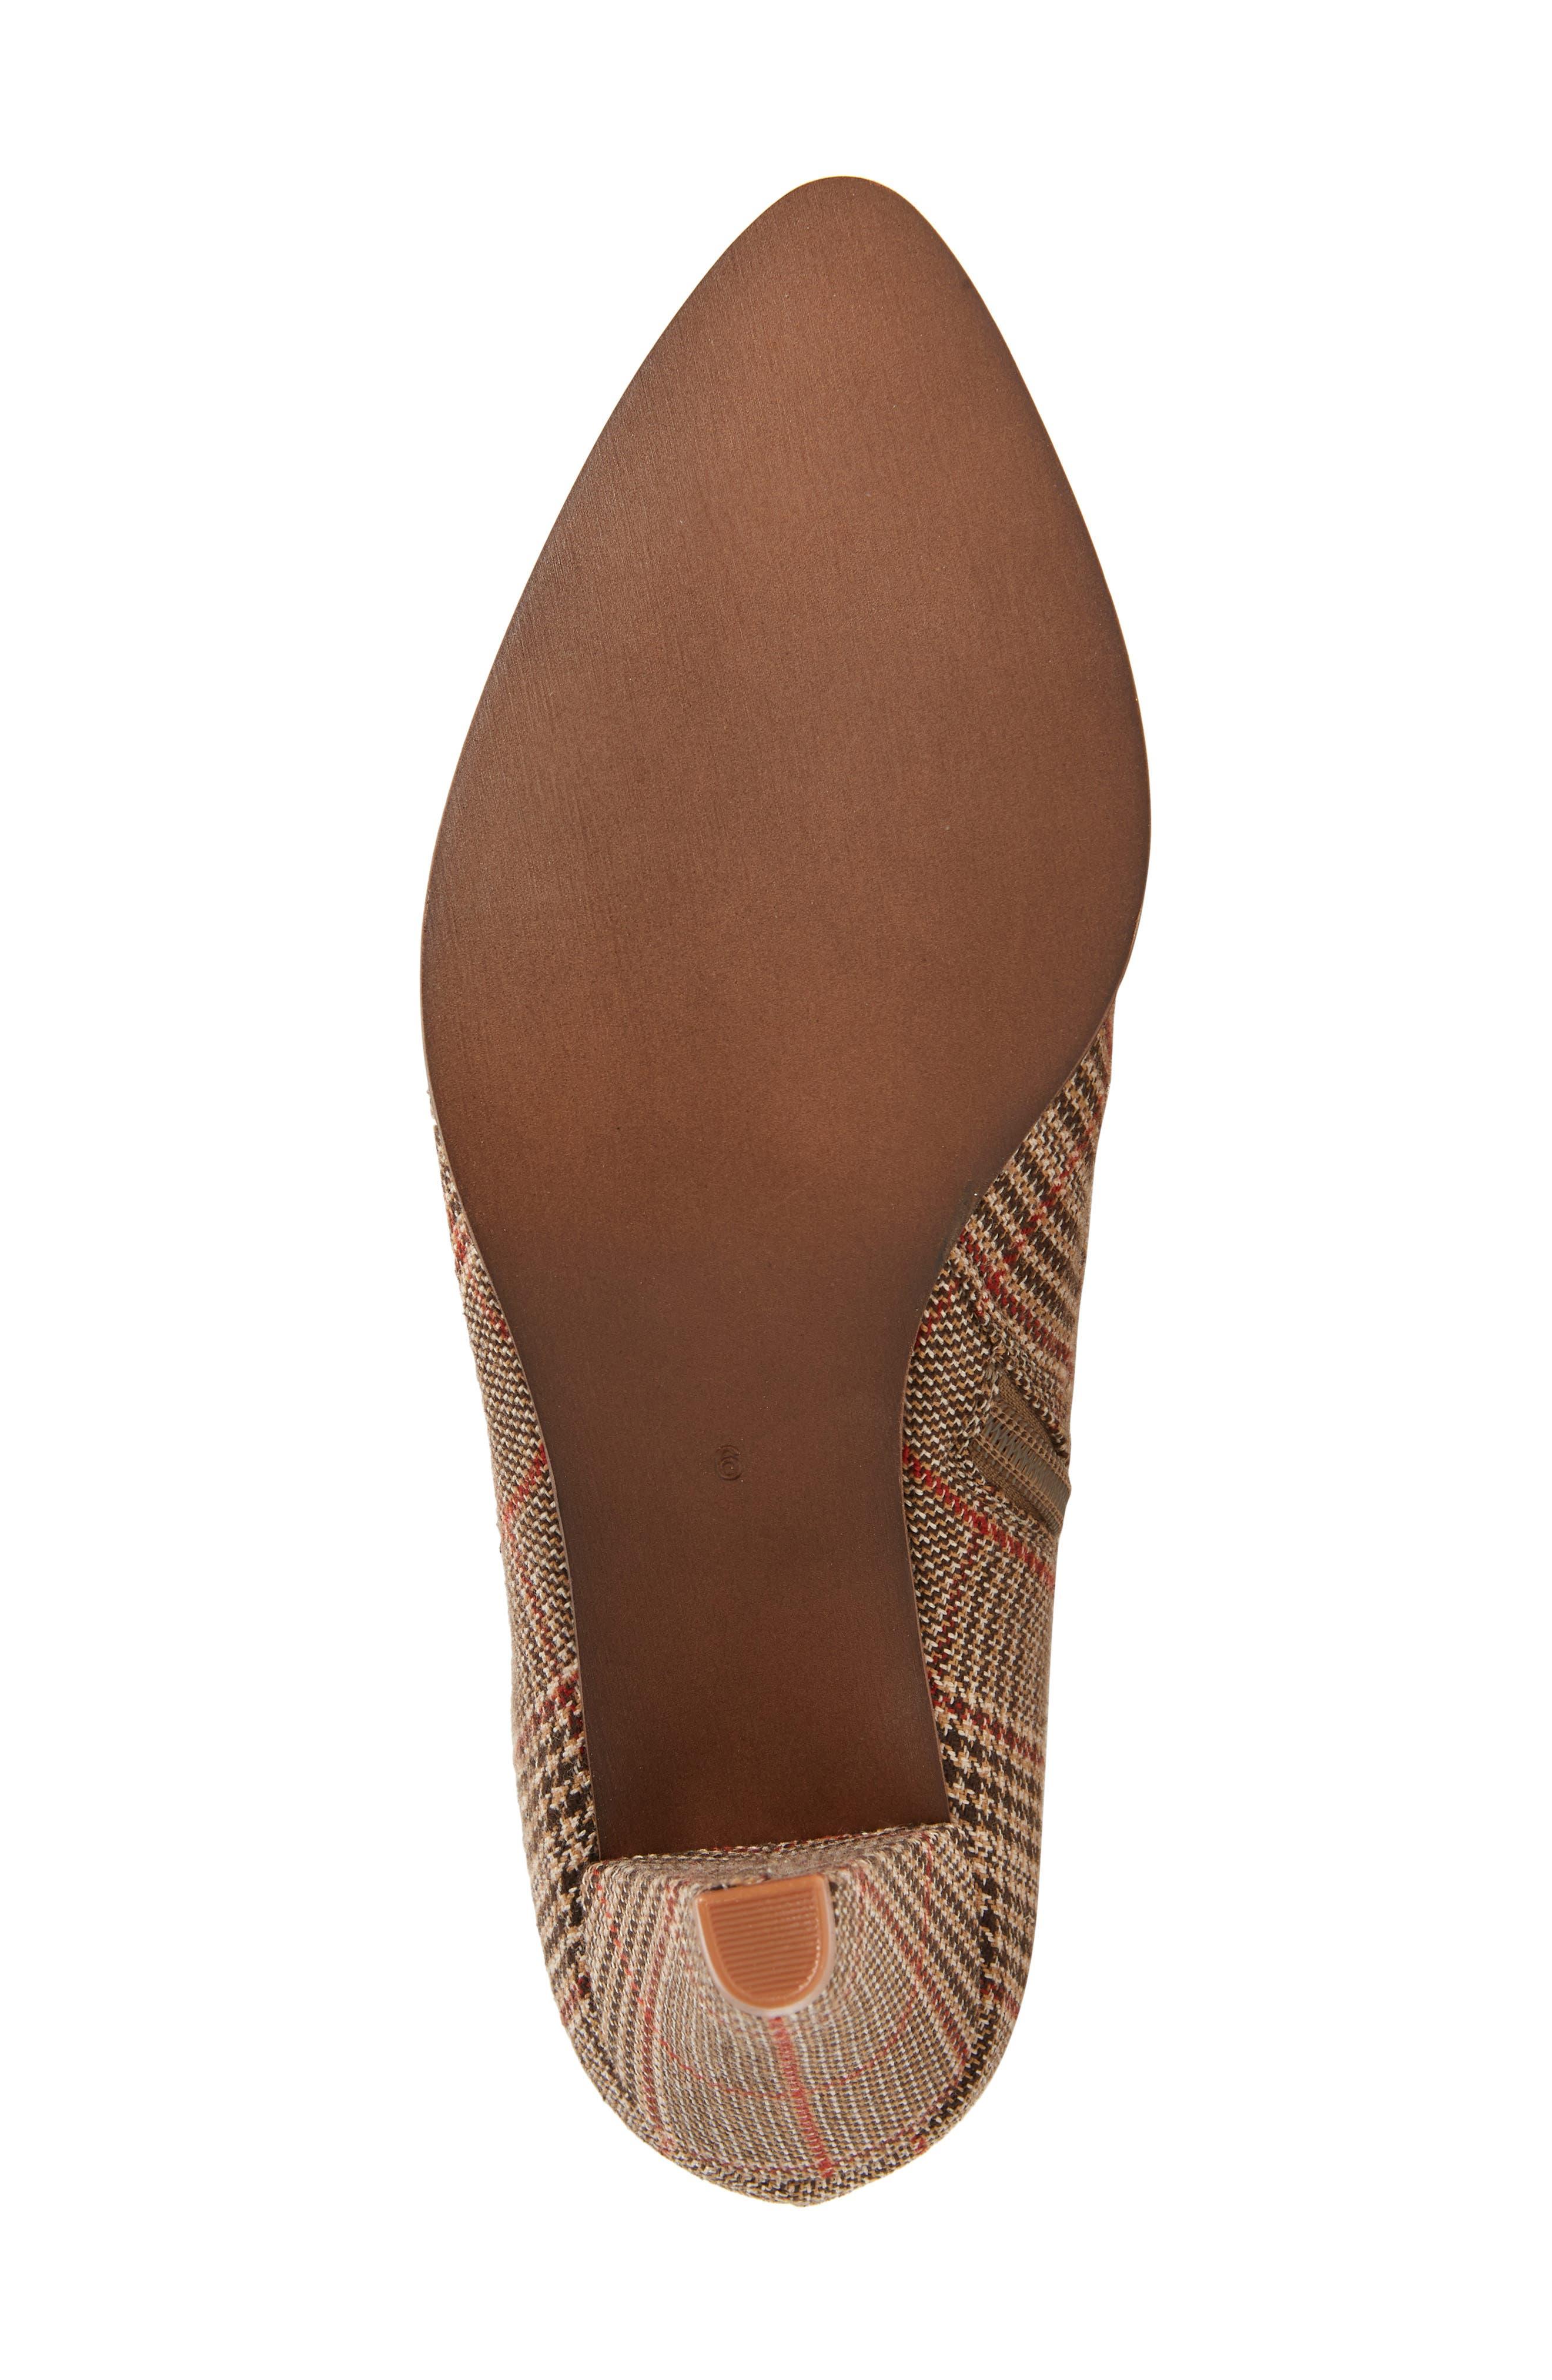 Go-Go-Girl Thigh High Boot,                             Alternate thumbnail 6, color,                             BEIGE PLAID